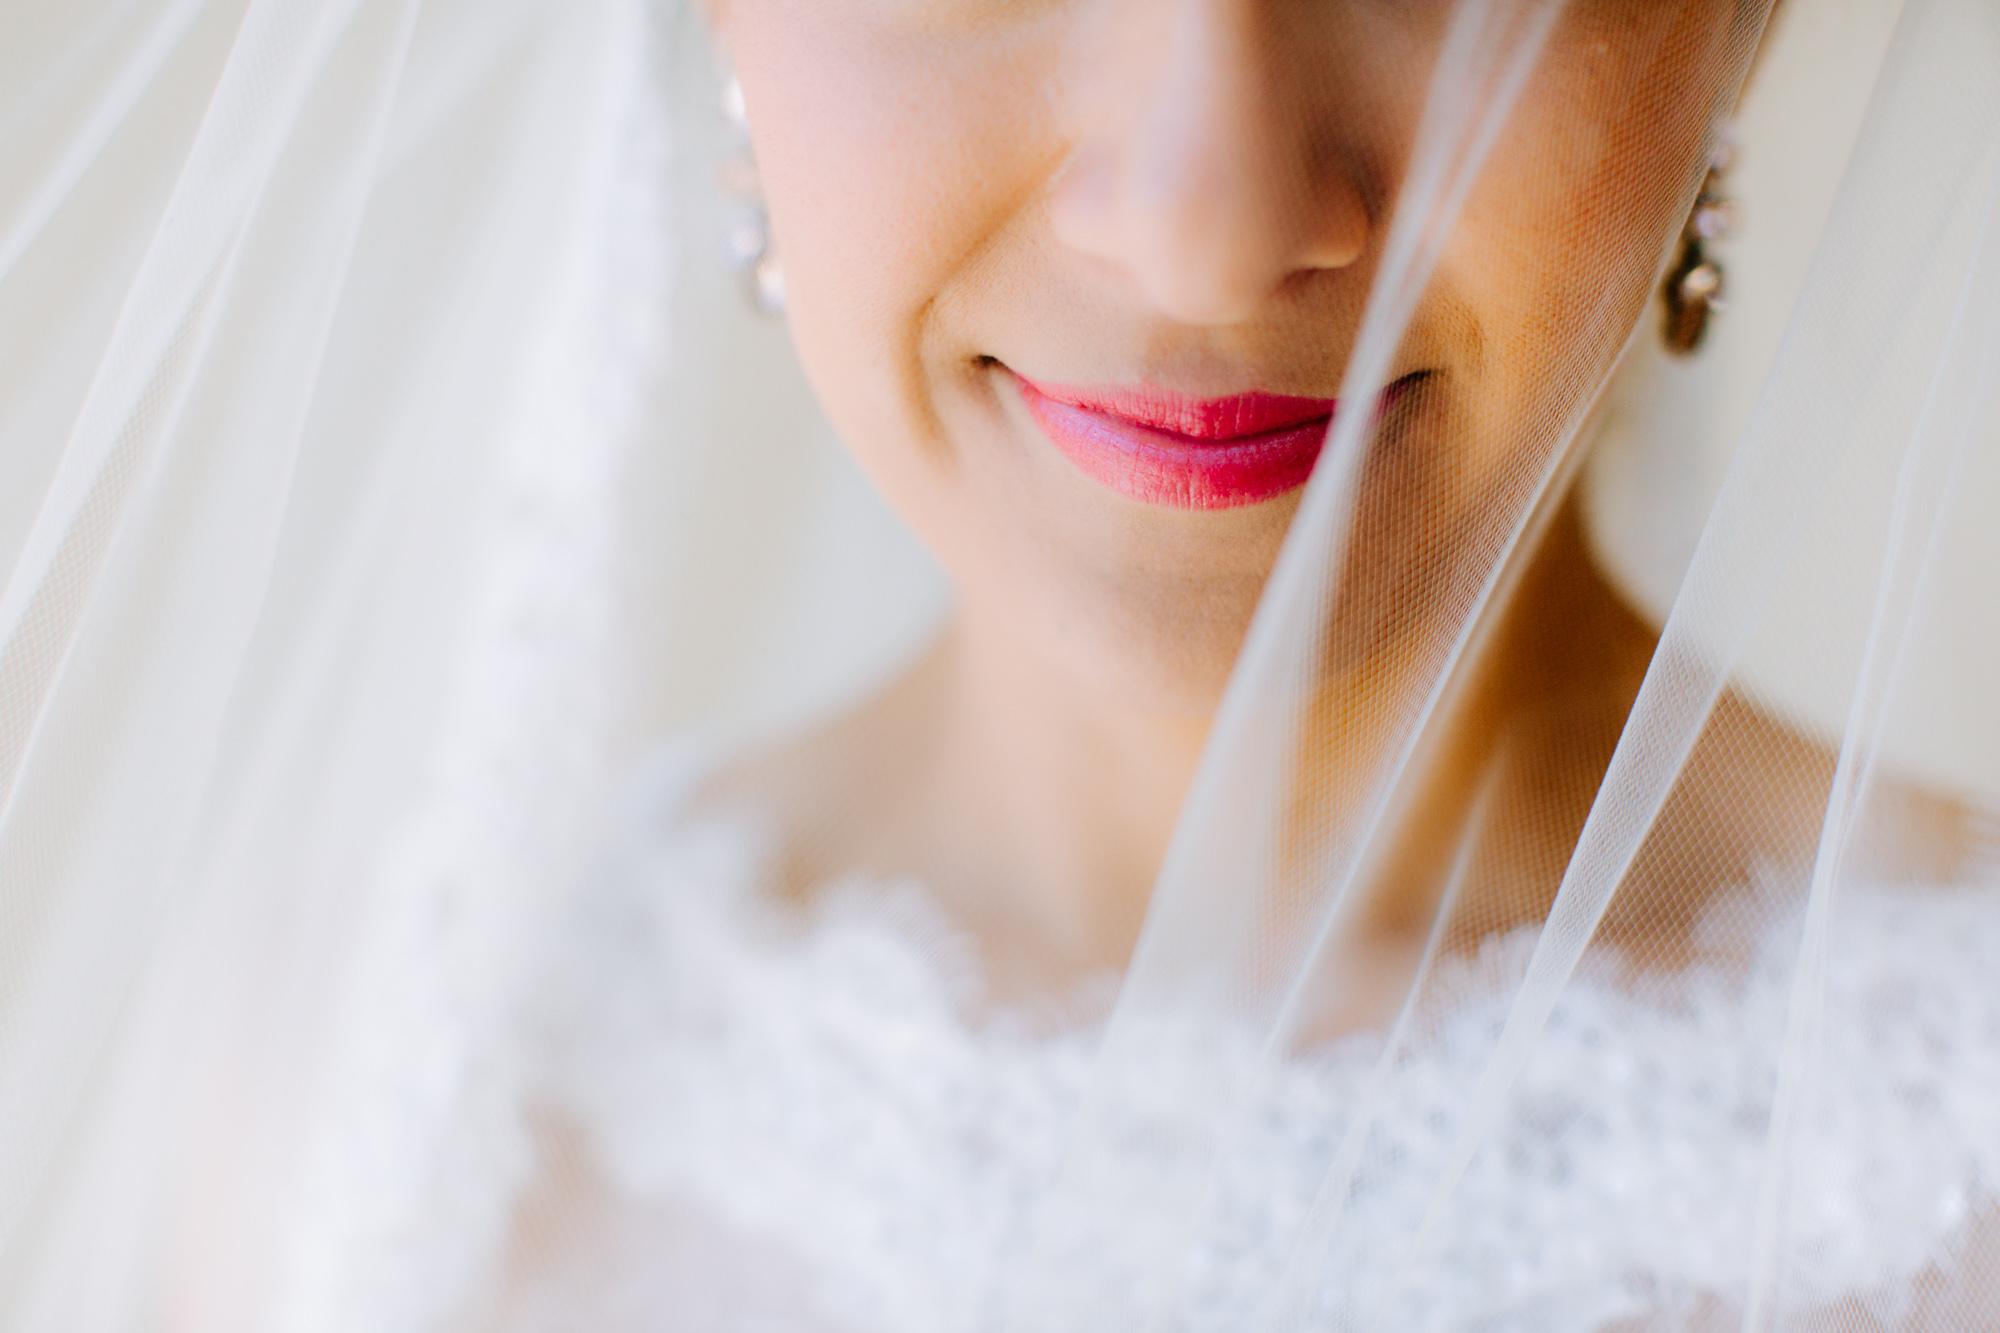 Texture Photo_Baker_Knoxville Wedding Photographer-7.jpg